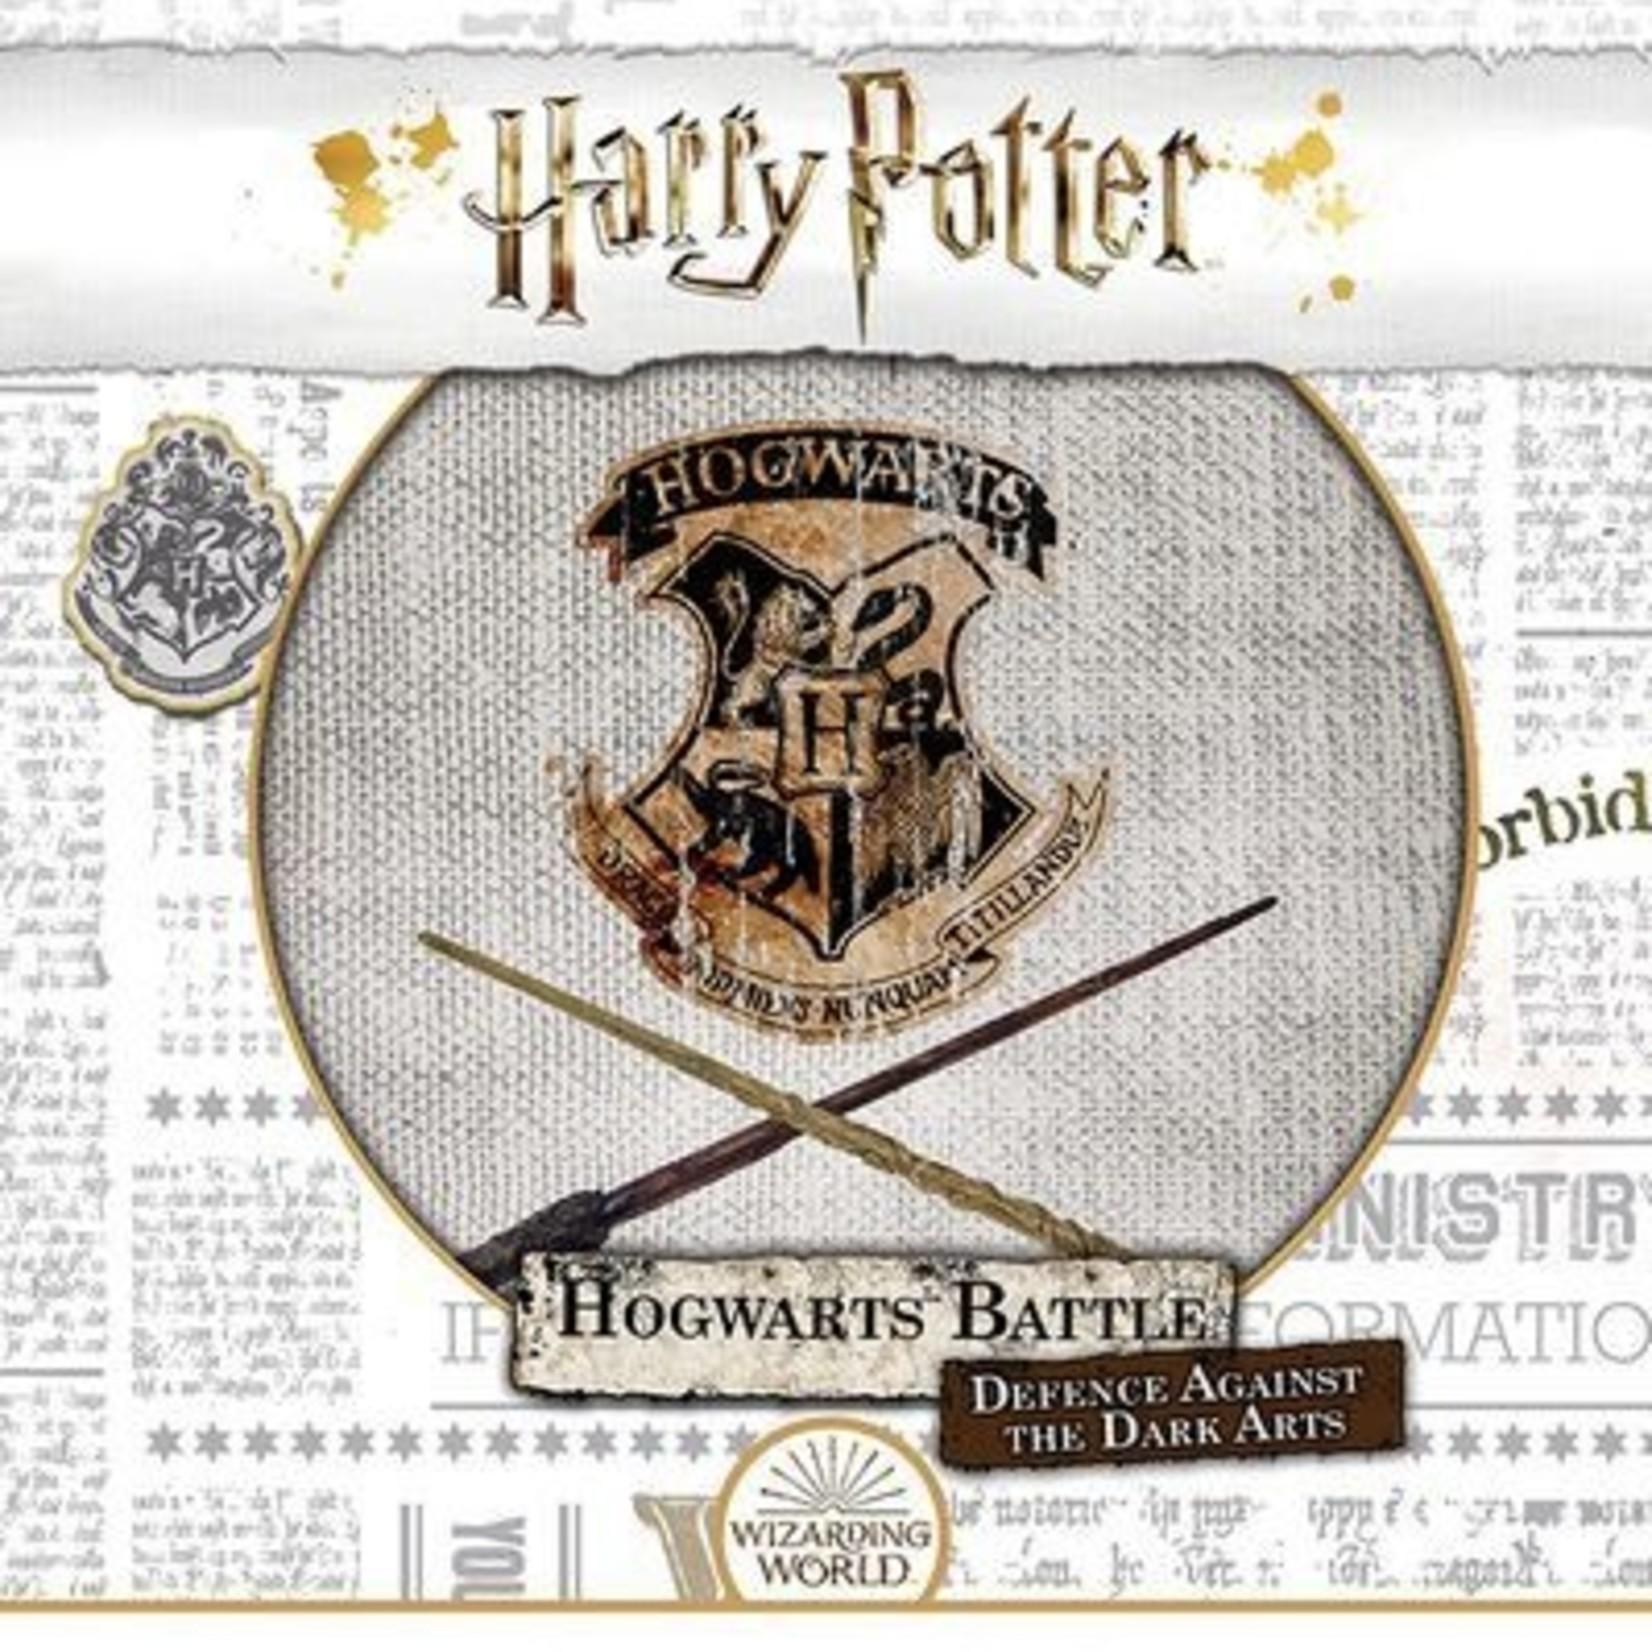 Harry Potter: Hogwarts Battle - Defense Against The Dark Arts